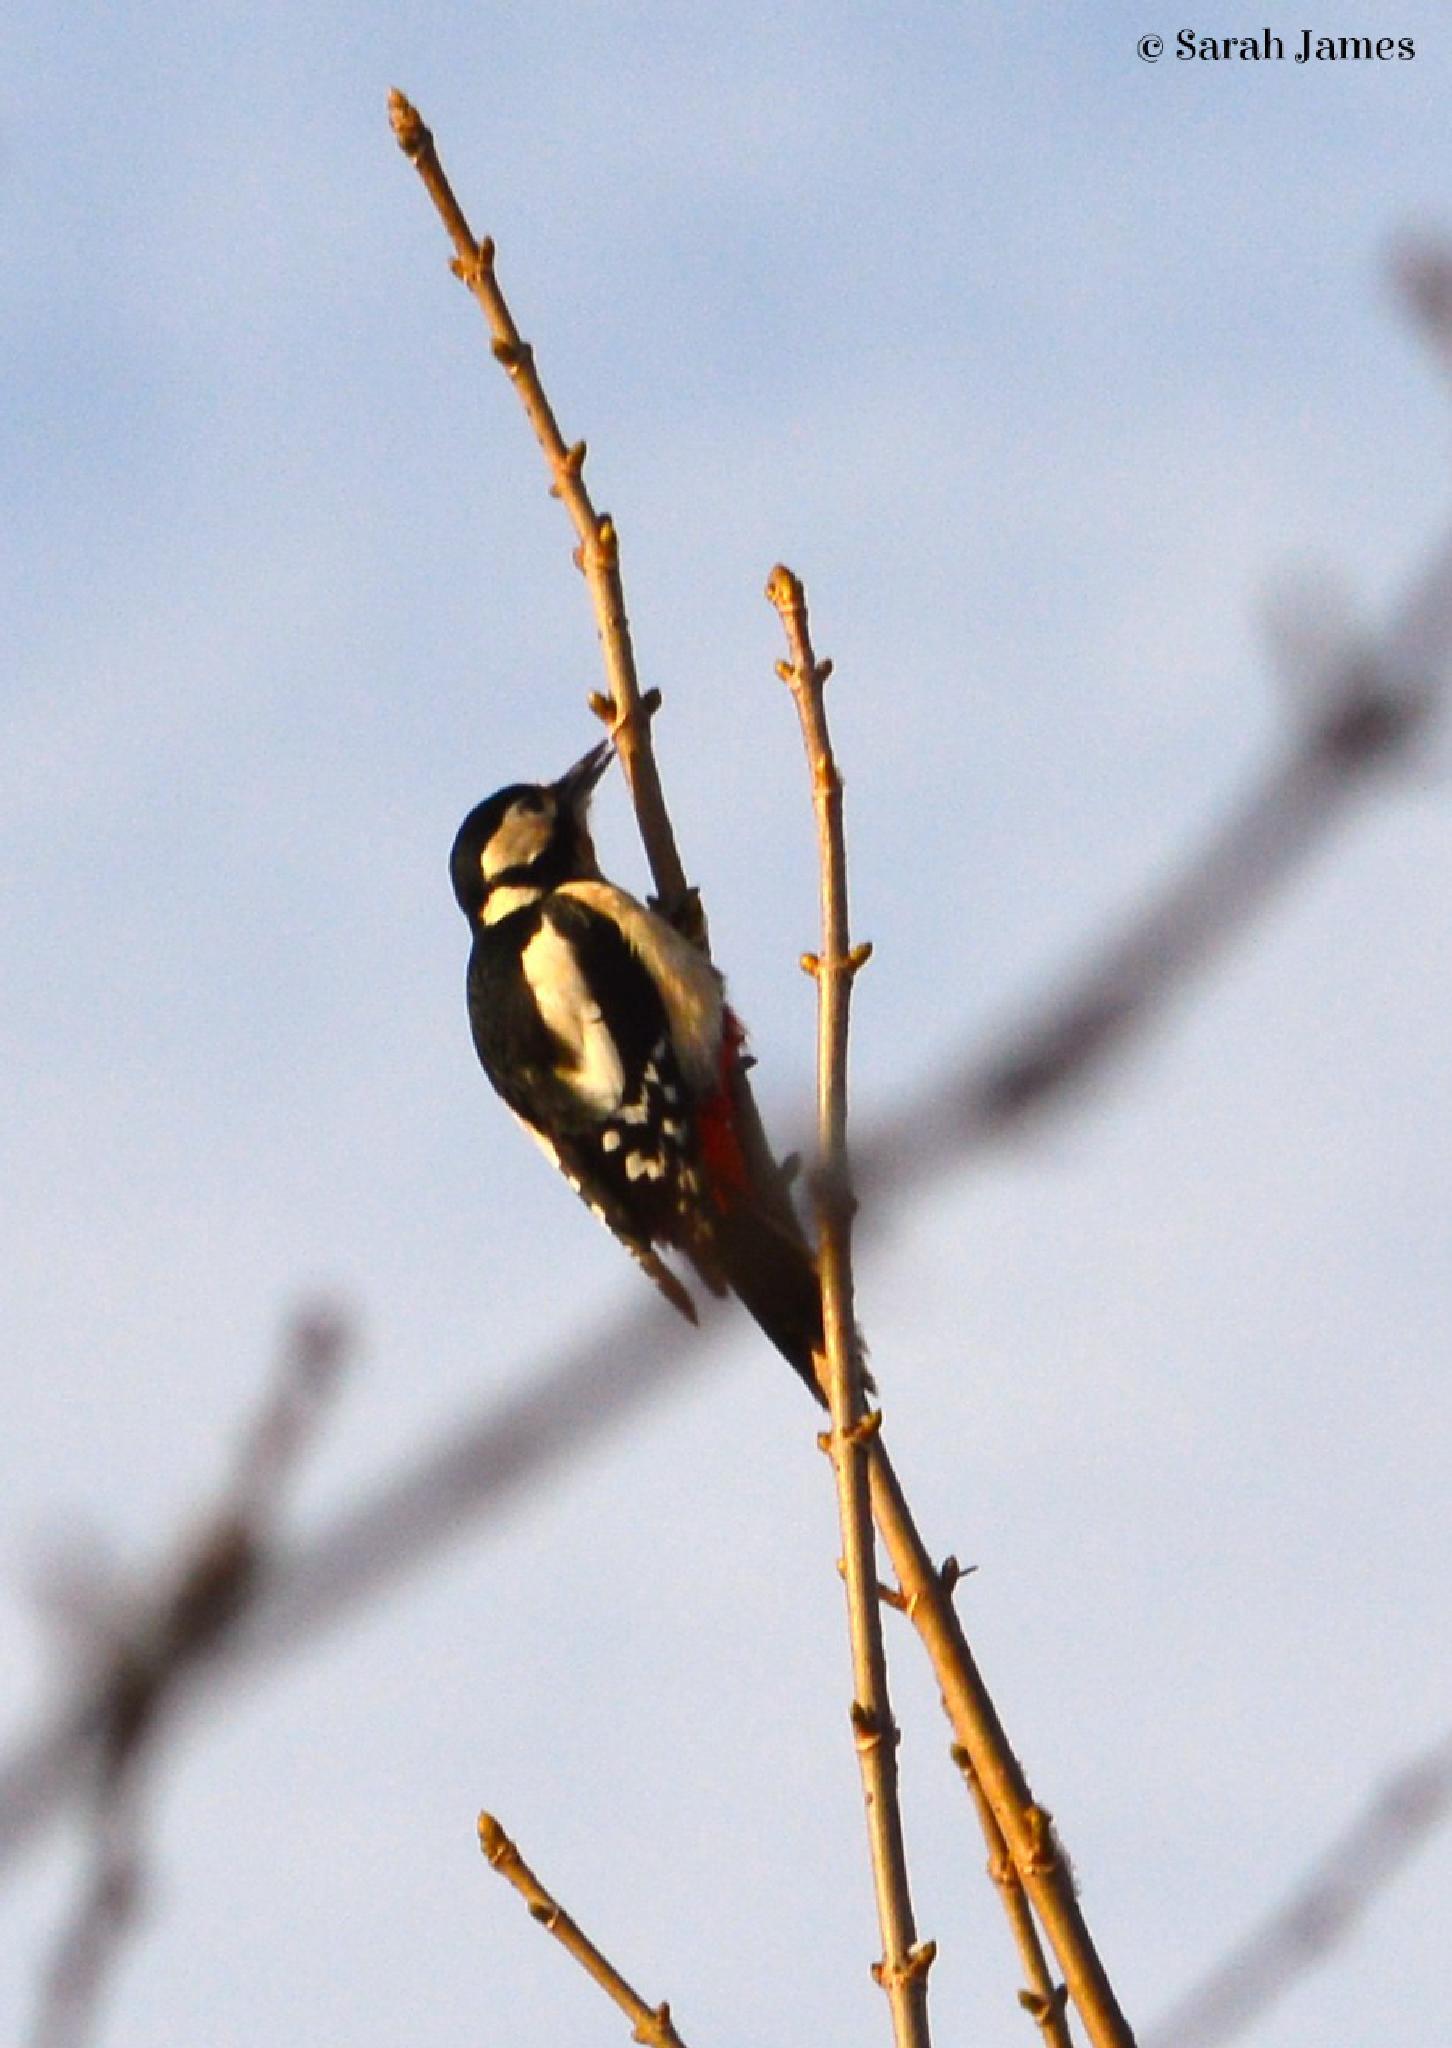 Woodpecker by Sarah James